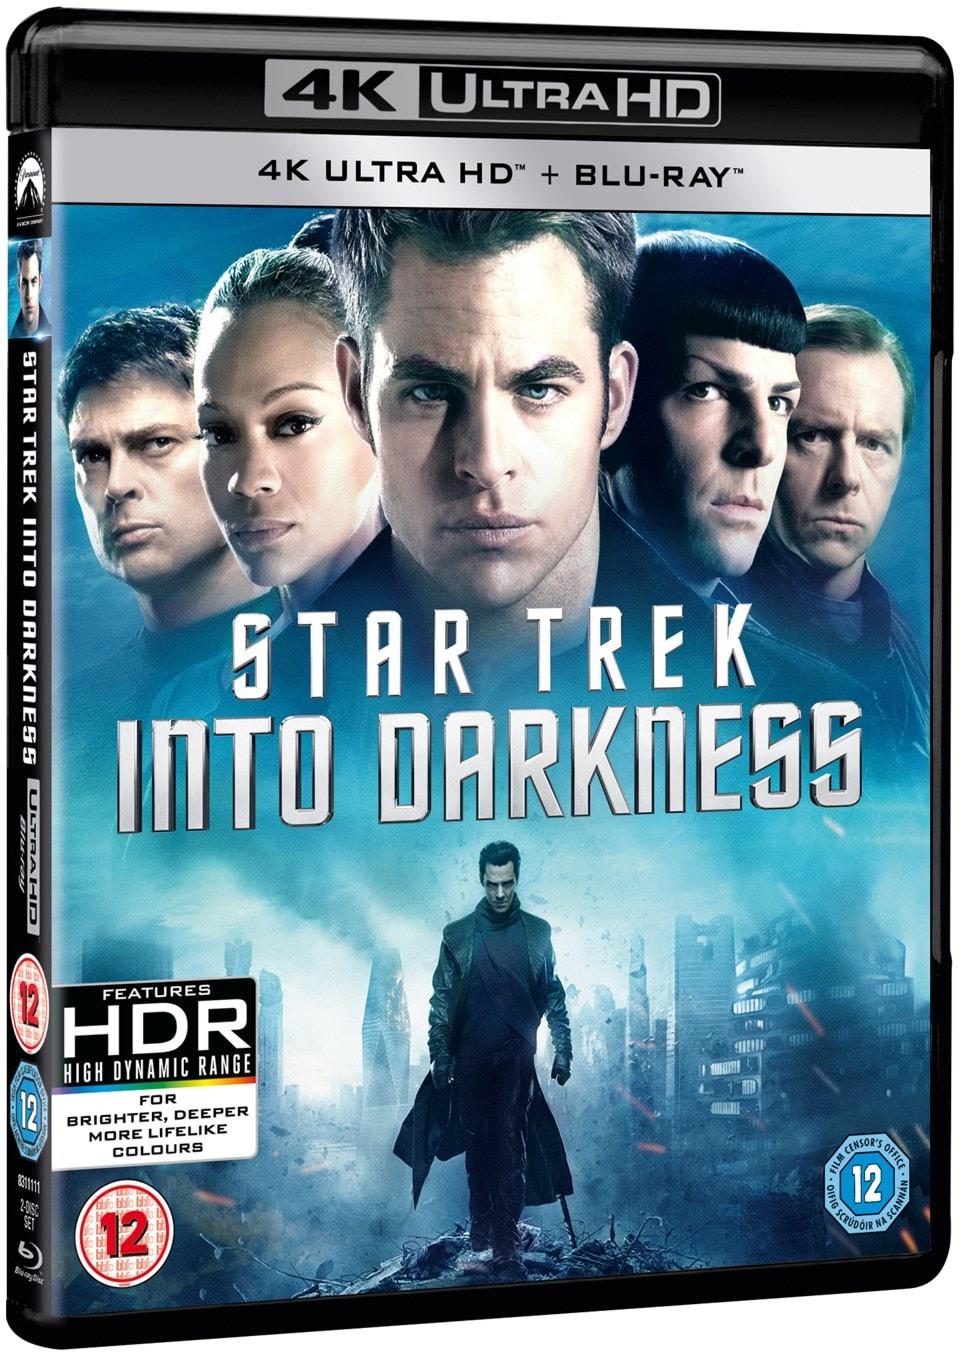 Star Trek Into Darkness - 2